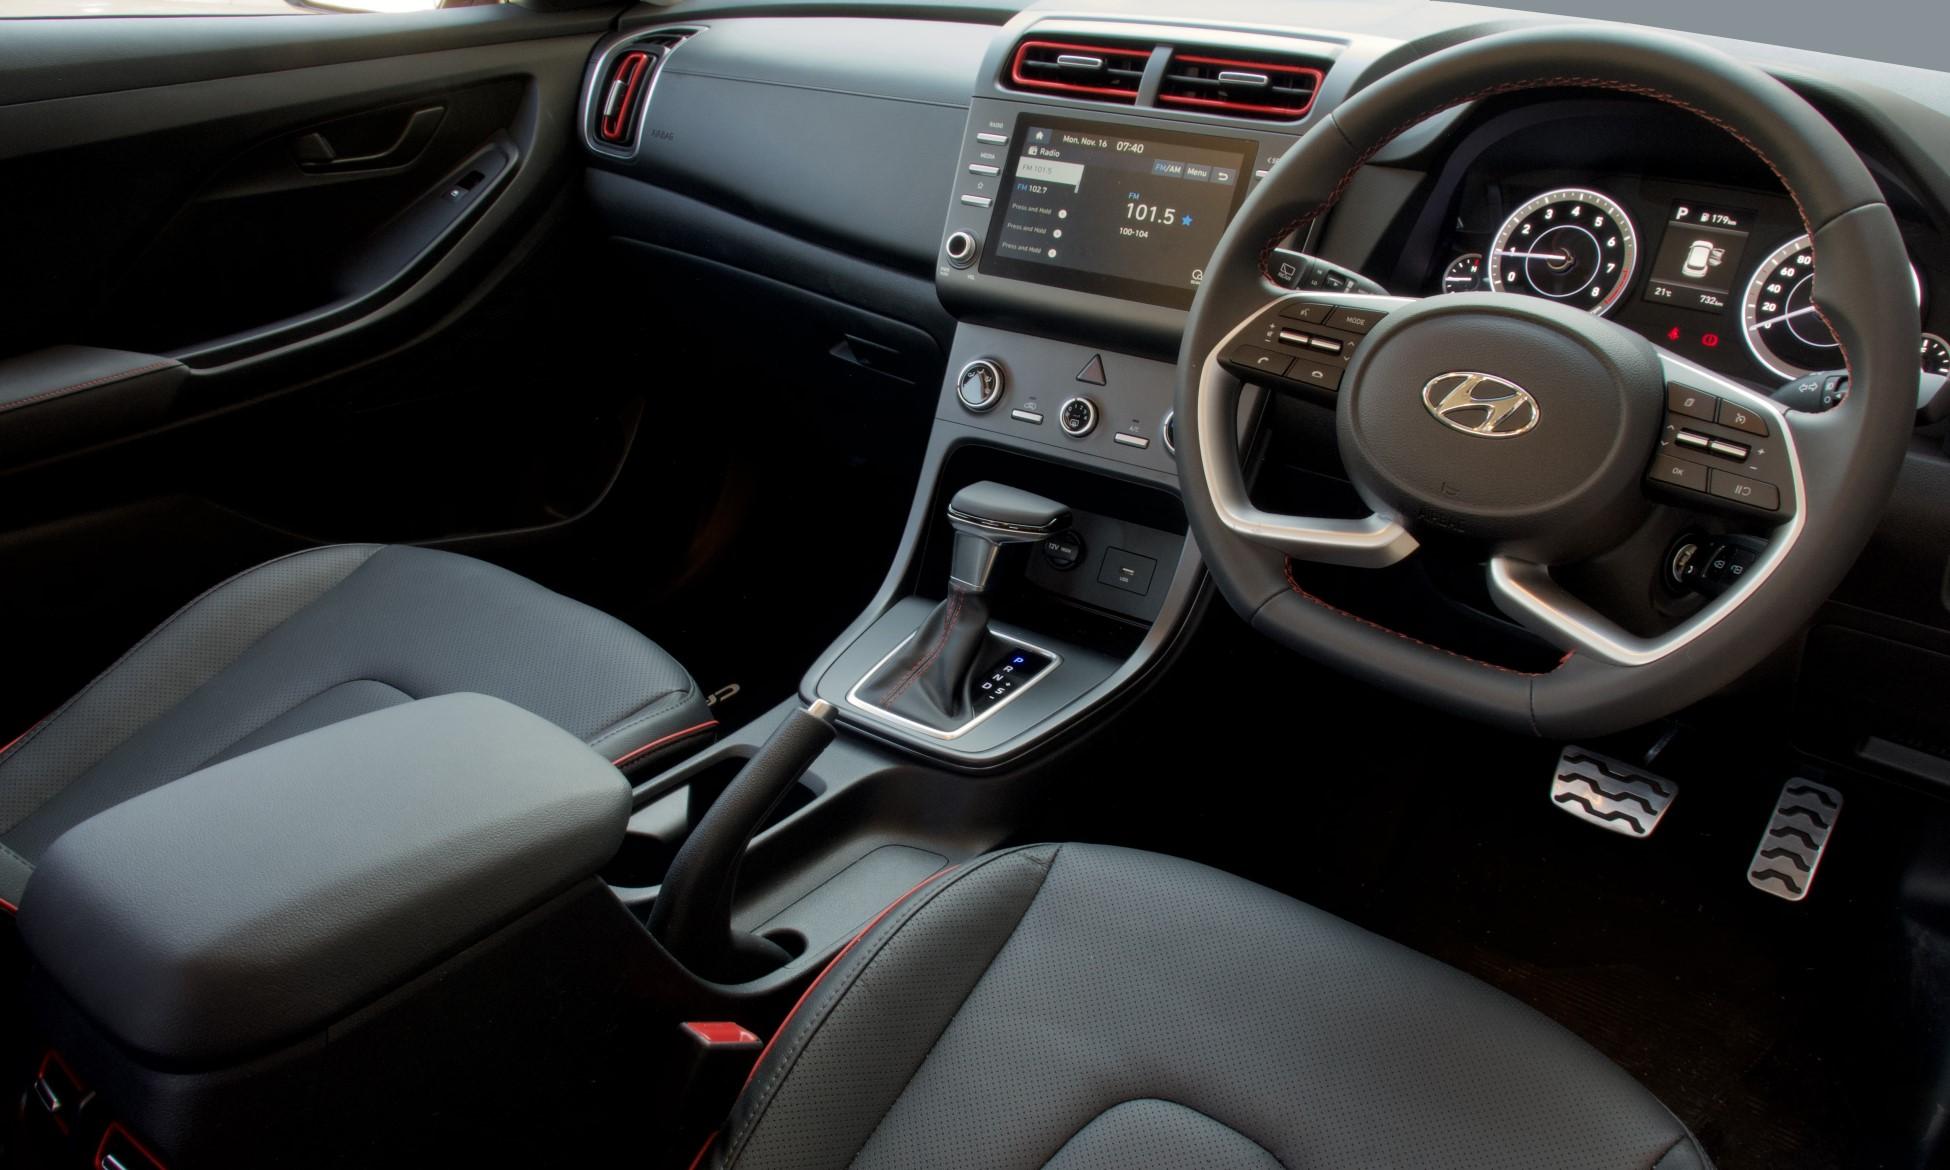 Hyundai Creta 1.4 TGDI Executive interior